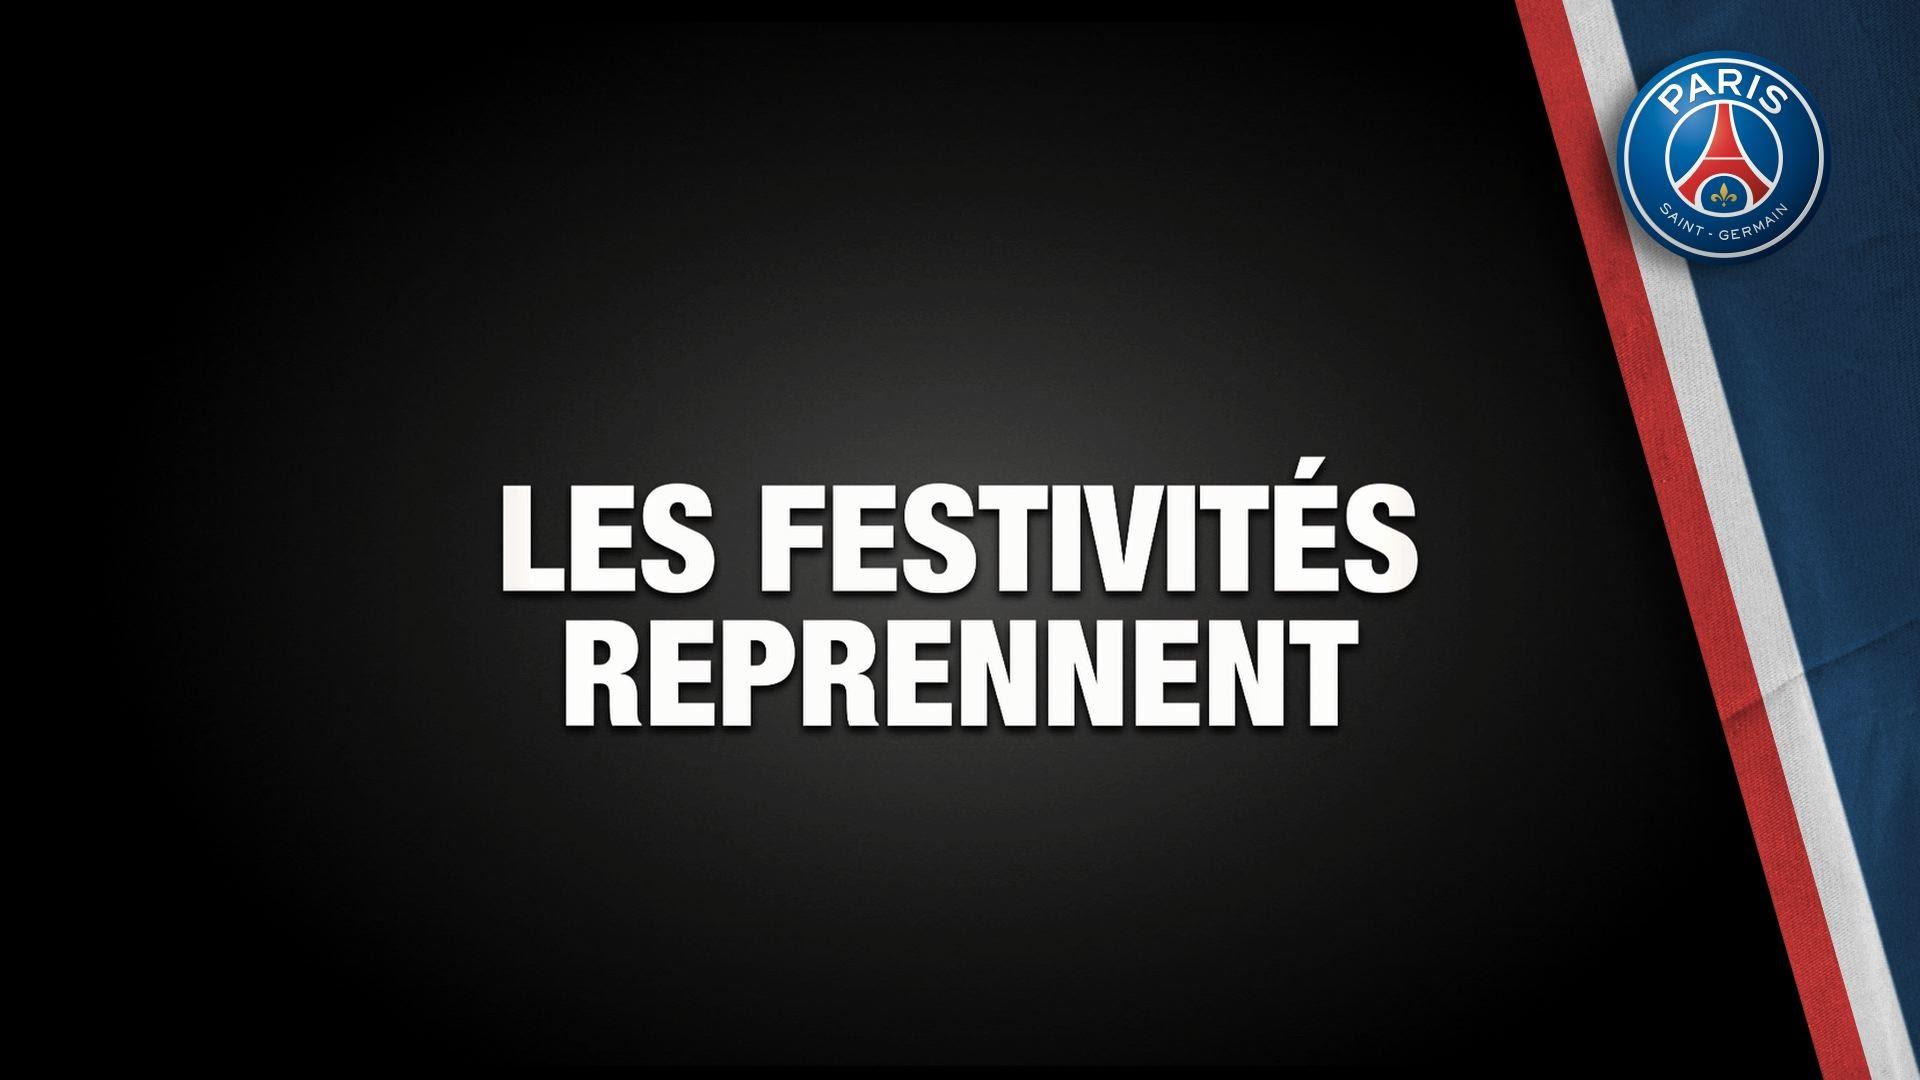 LES FESTIVITES REPRENNENT